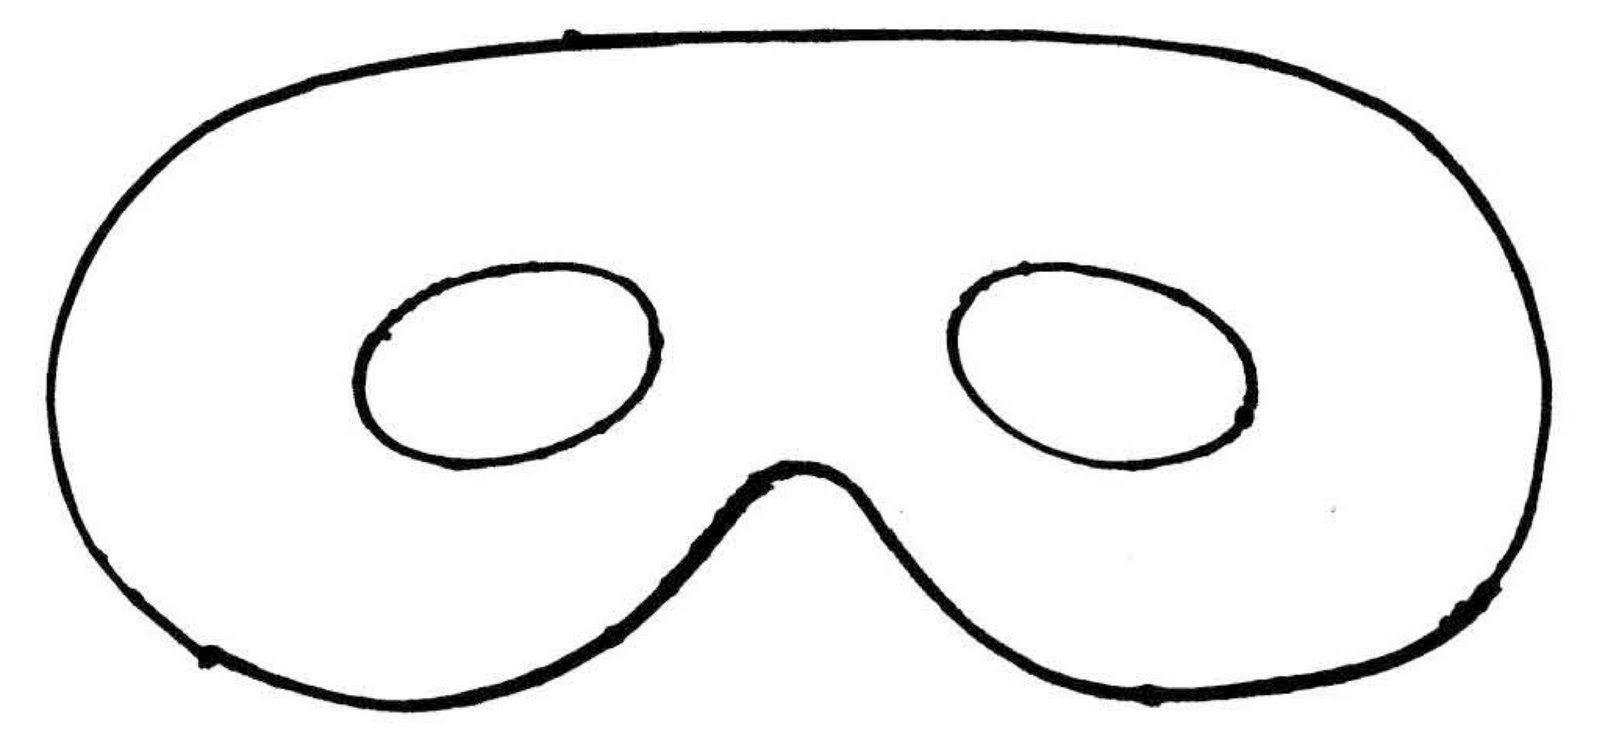 mask template - חיפוש ב-Google   Doing It Myself   Pinterest